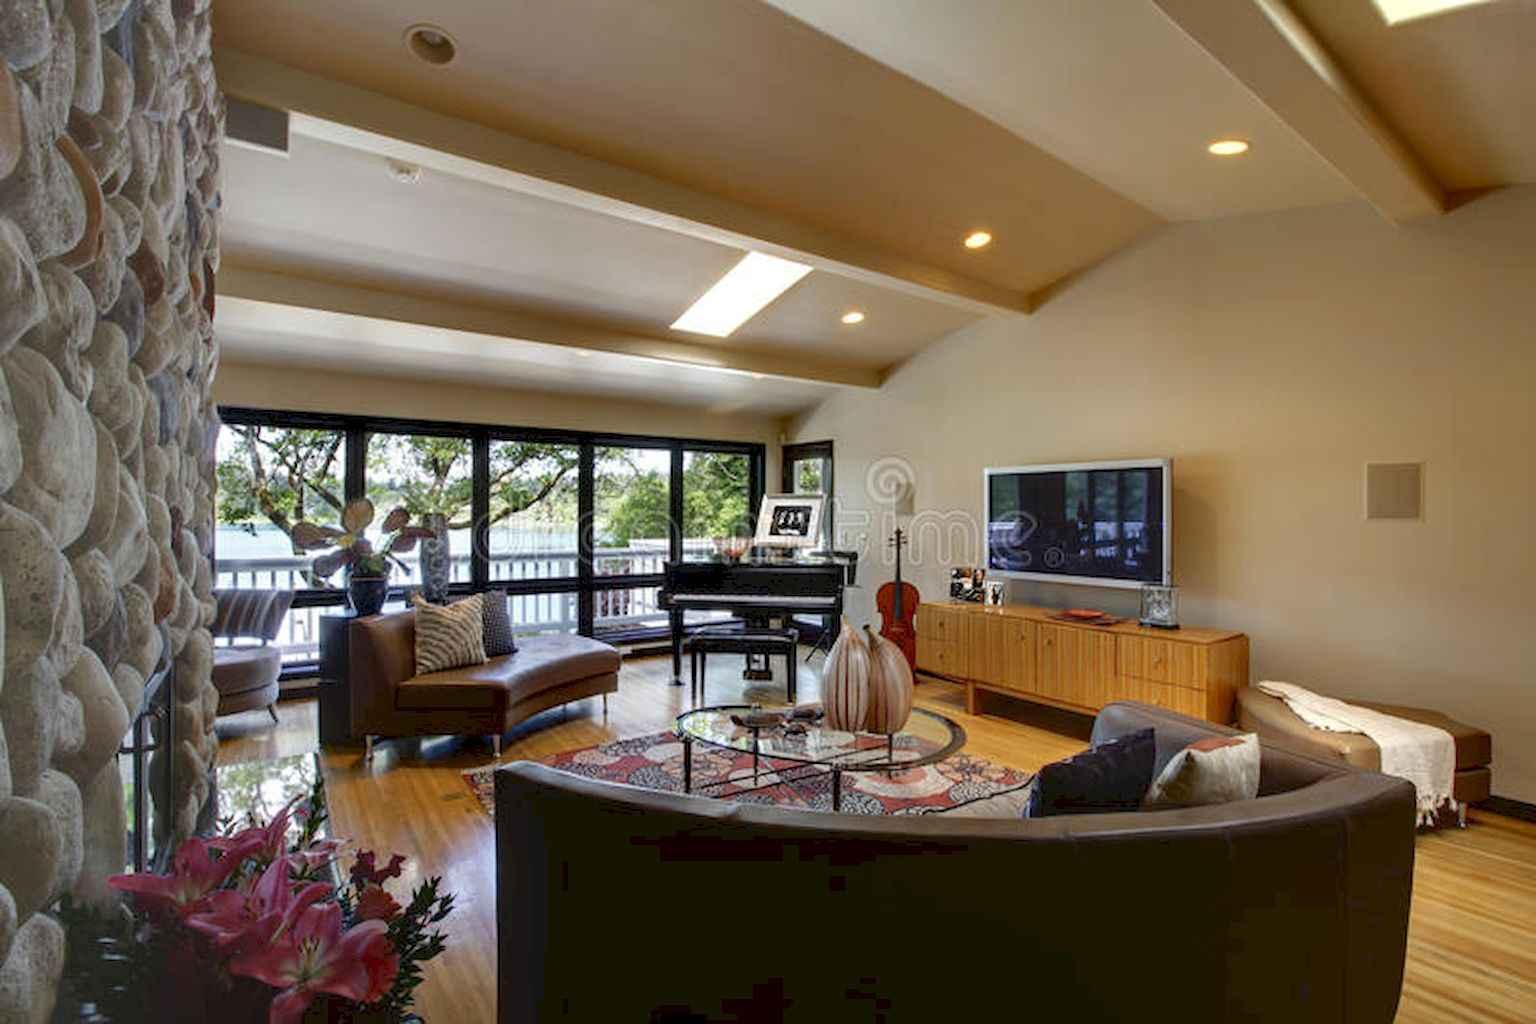 80 Elegant Harmony Interior Design Ideas For First Couple (63)